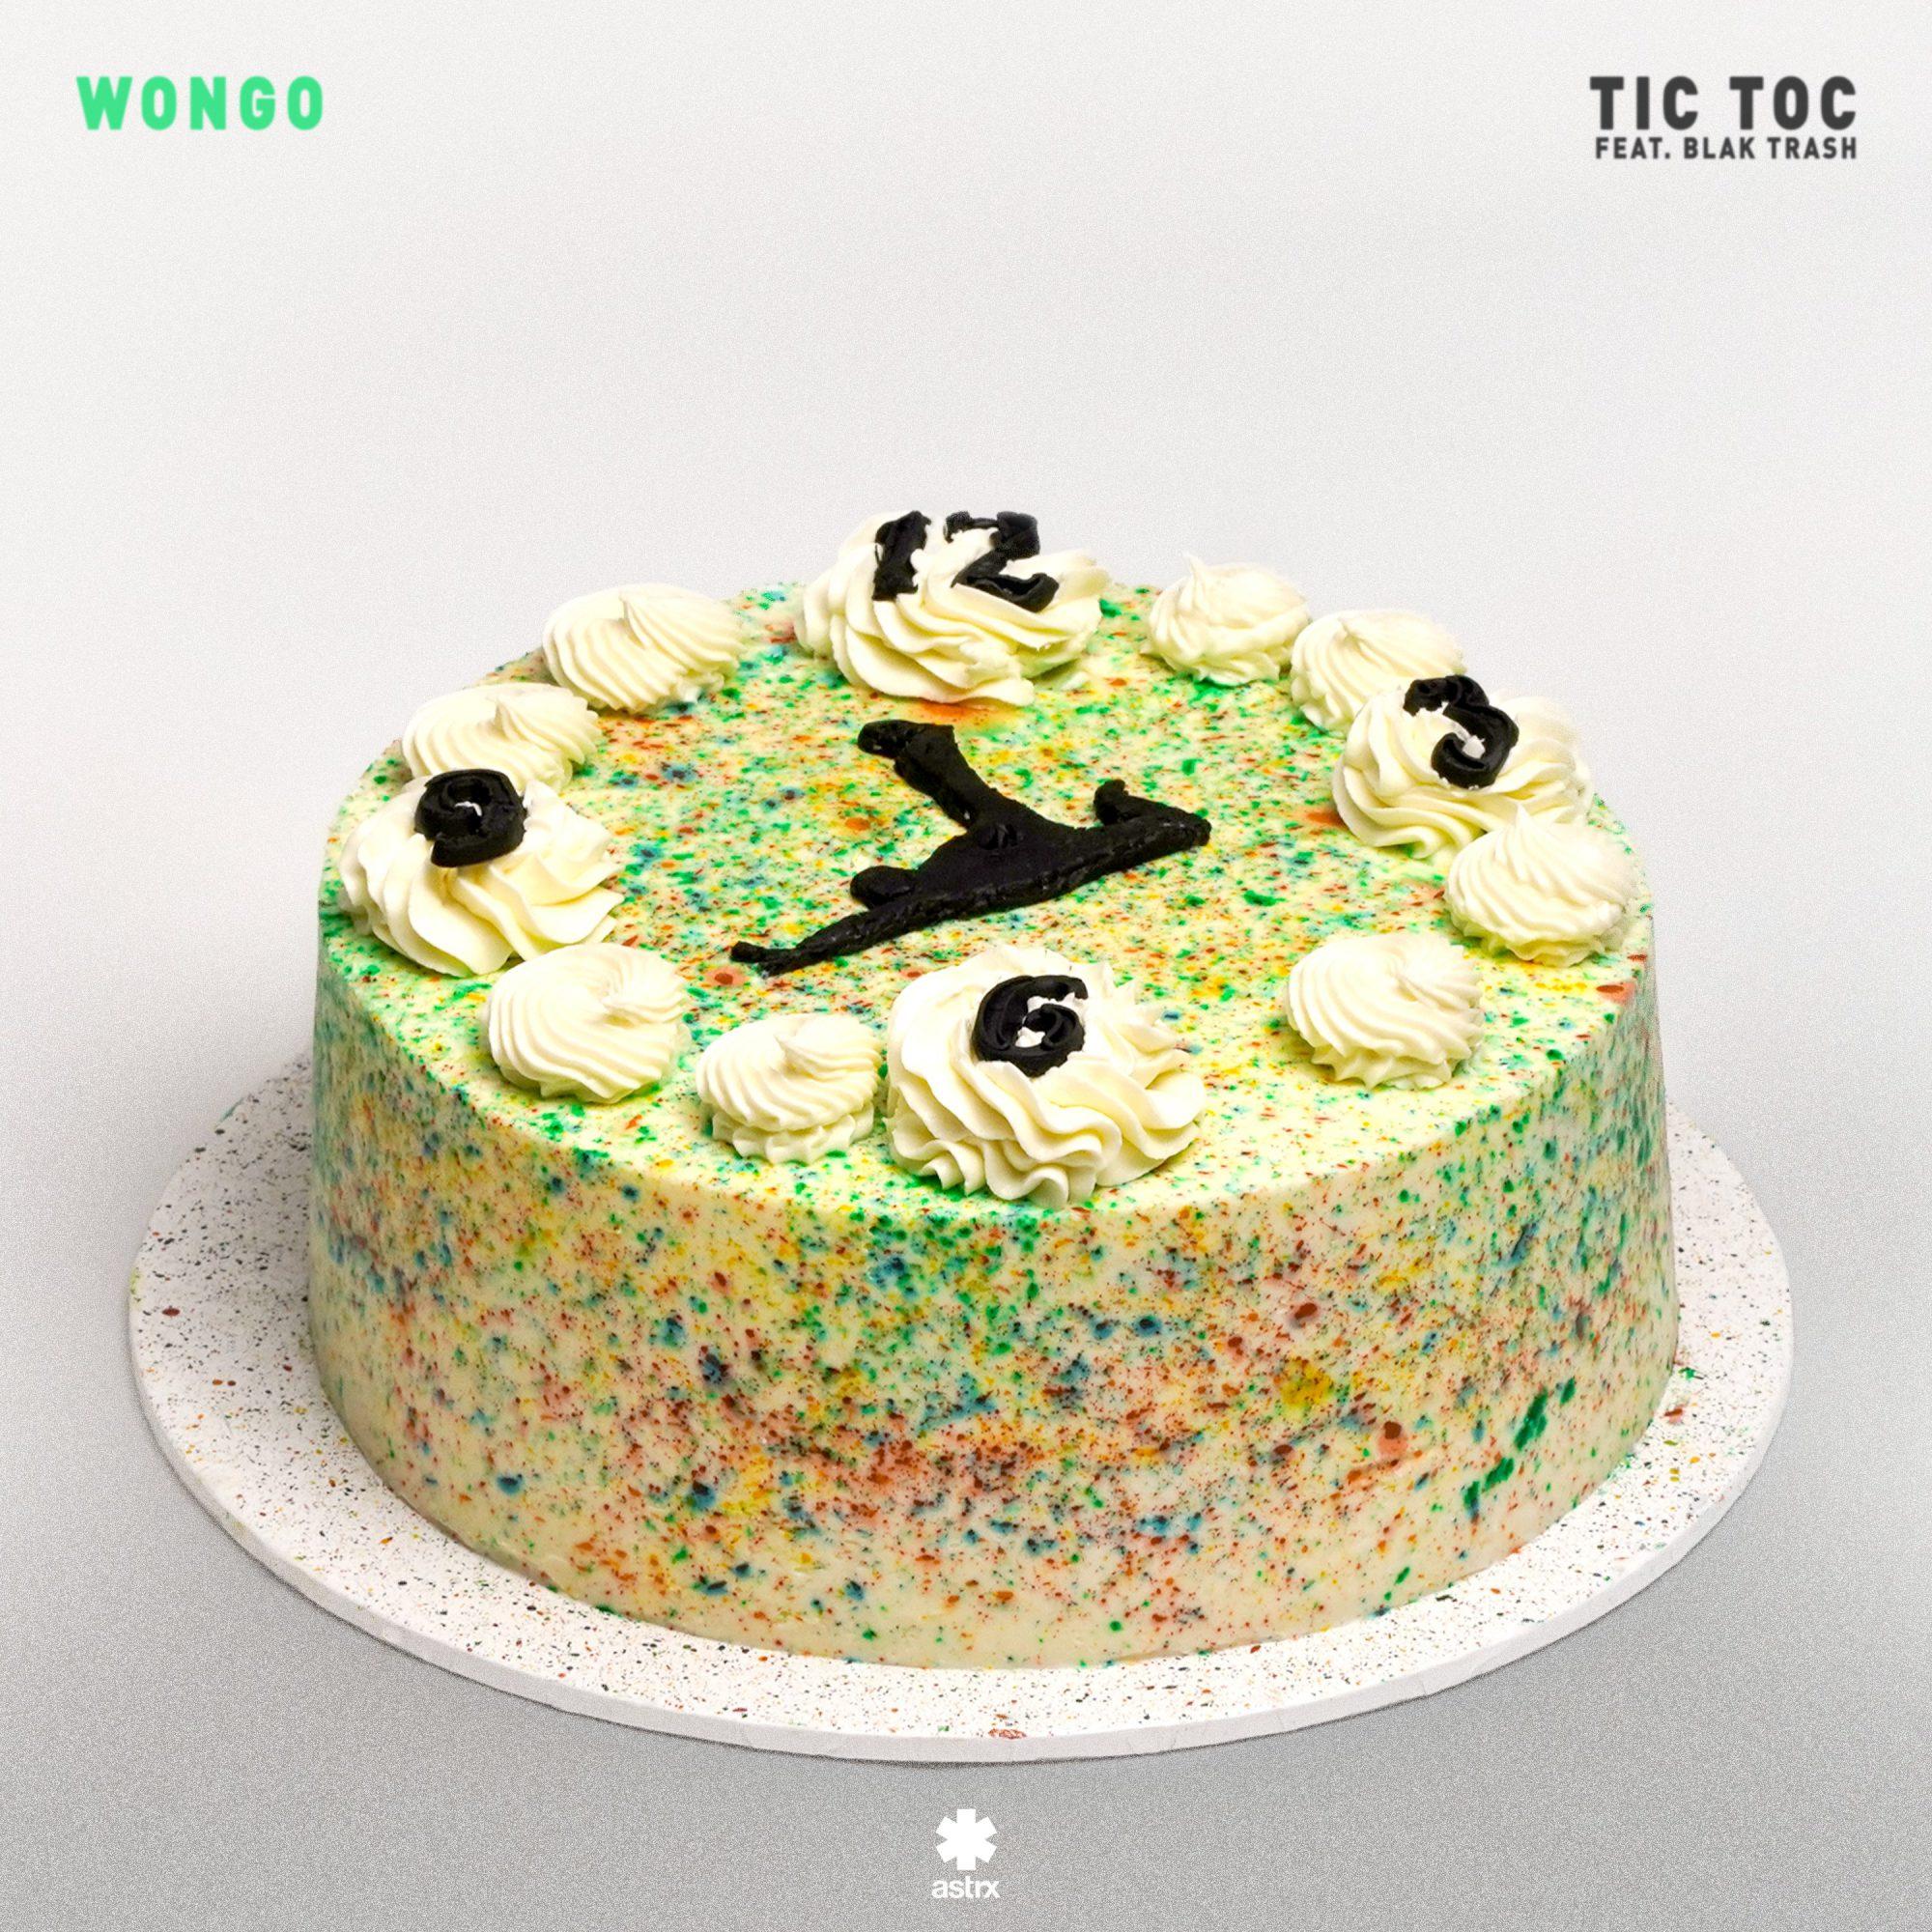 Wongo Tic Toc